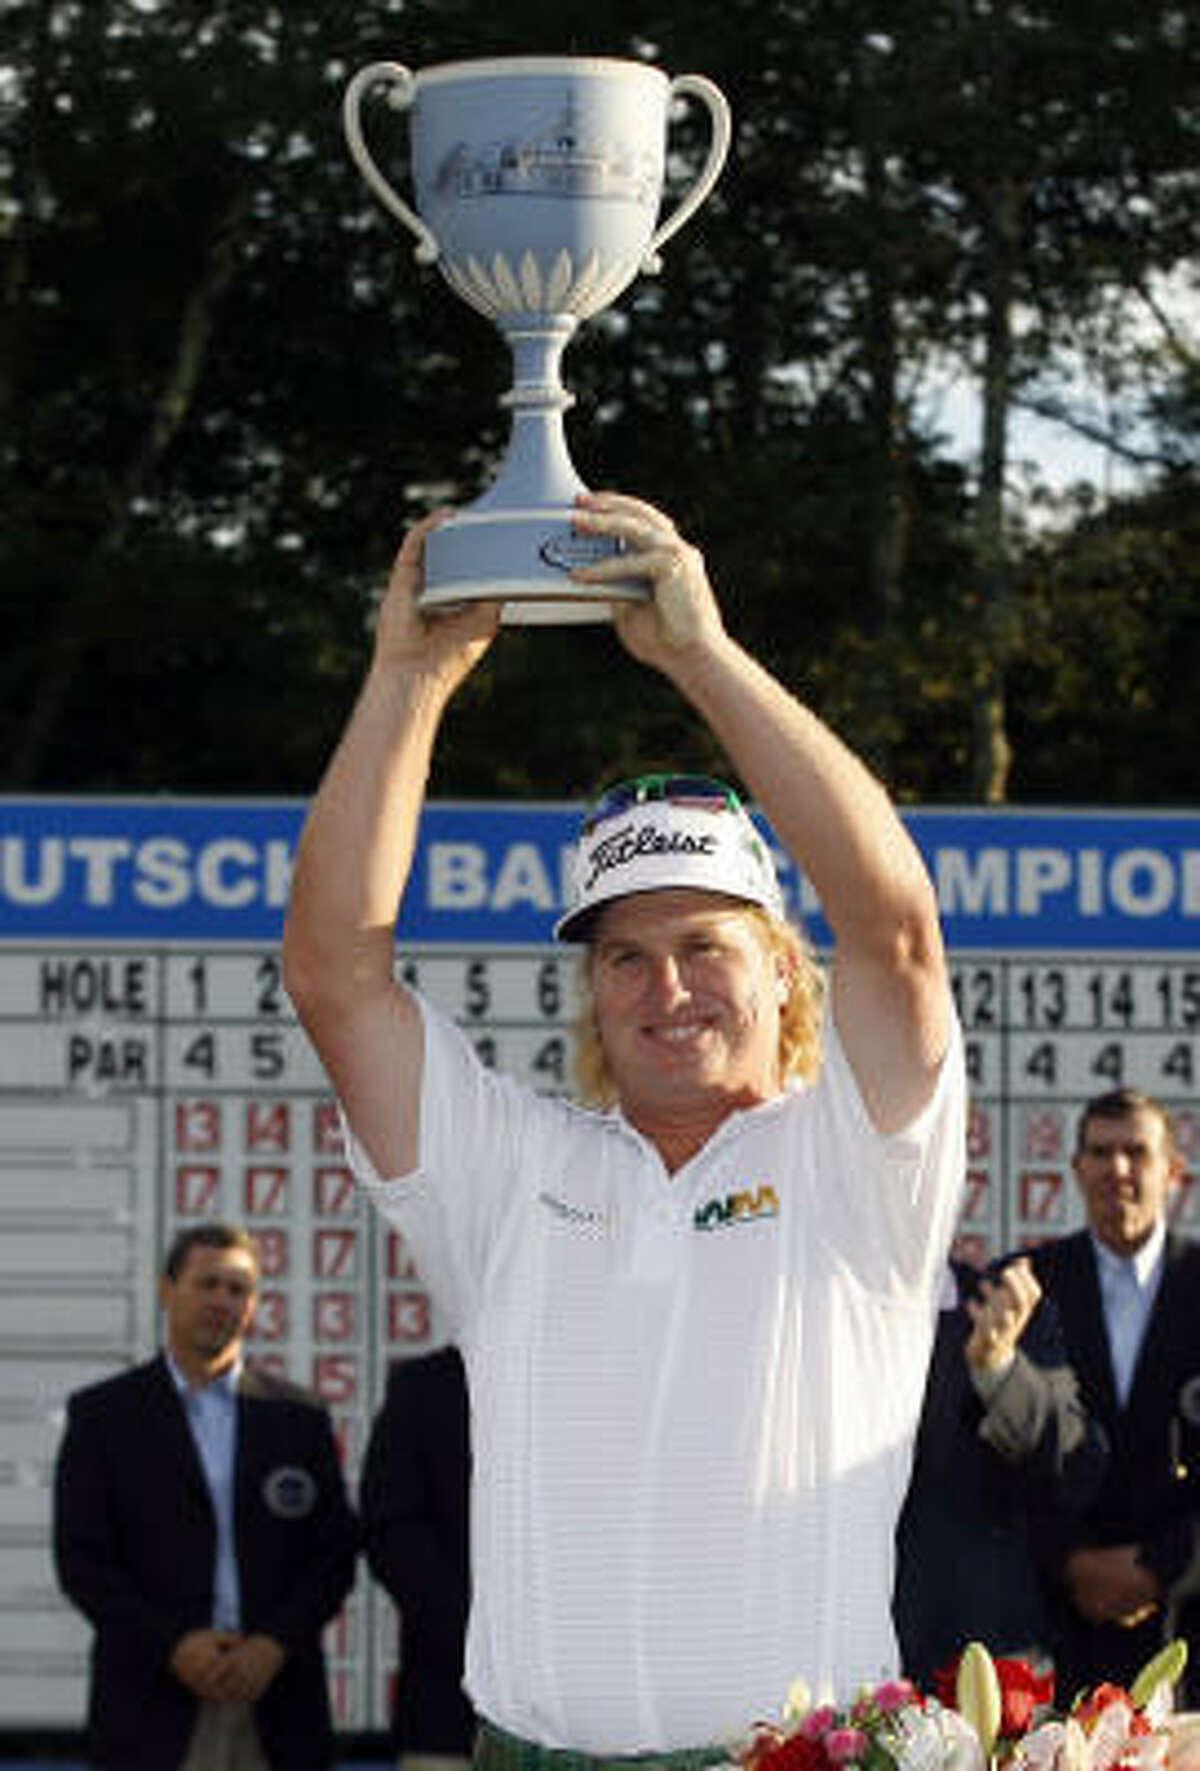 Charley Hoffman raises the trophy for winning the Deutsche Bank Championship.